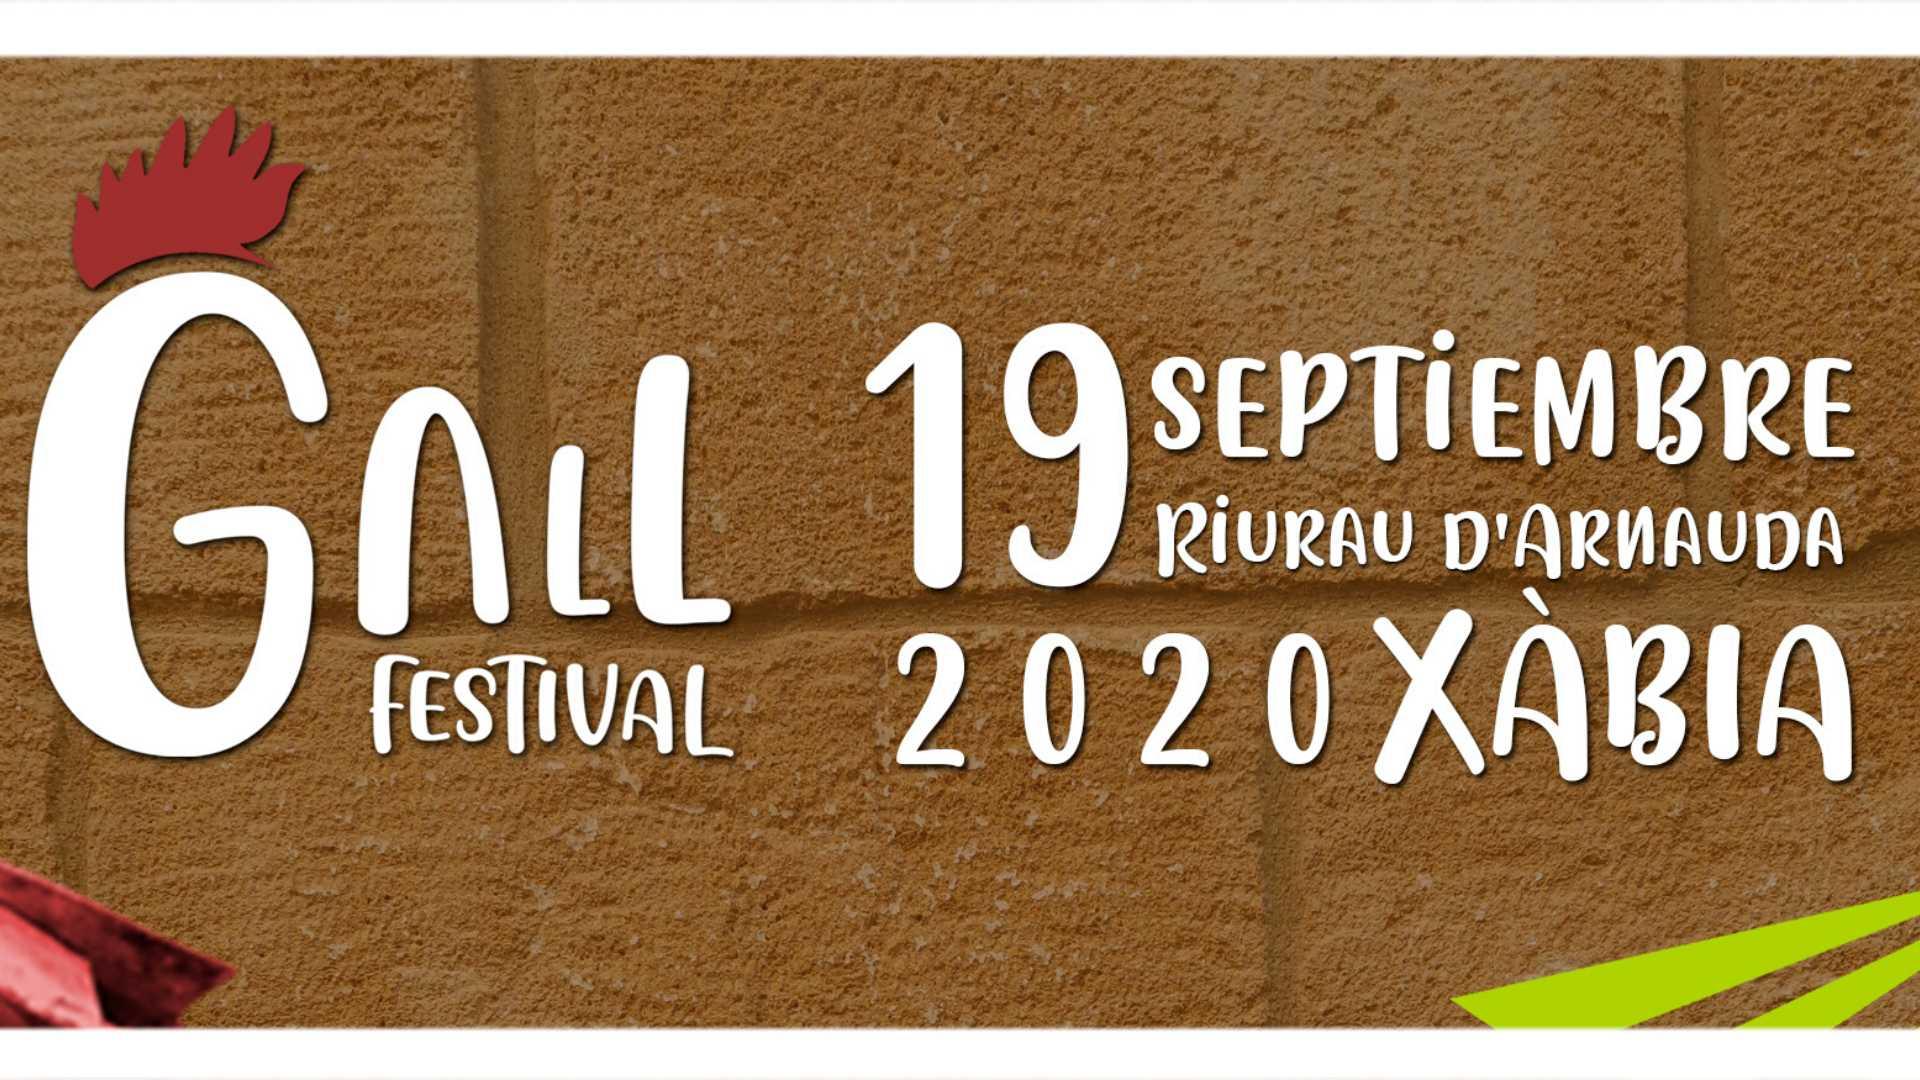 gall festival